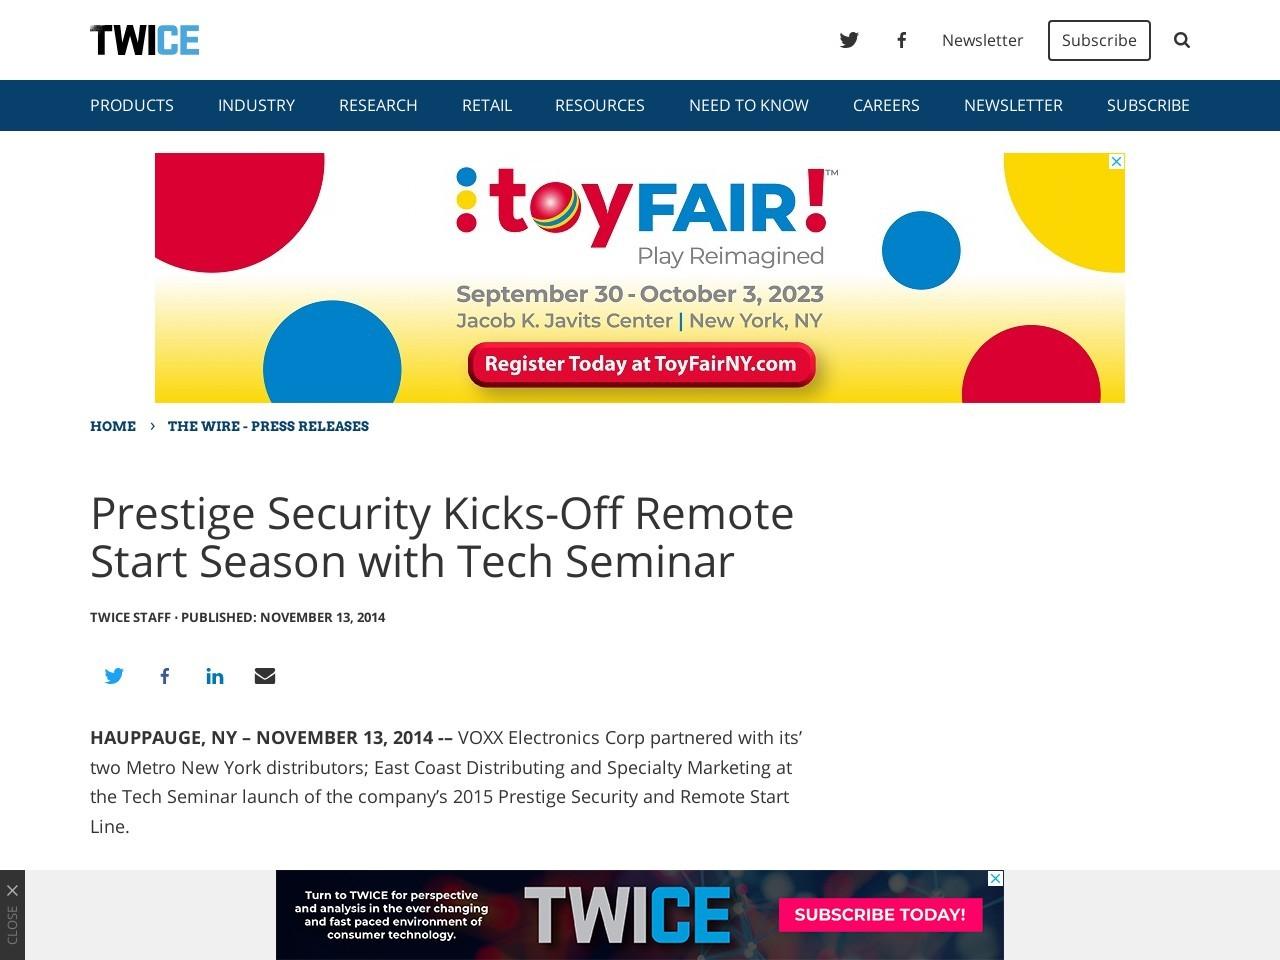 Prestige Security Kicks-Off Remote Start Season with Tech Seminar